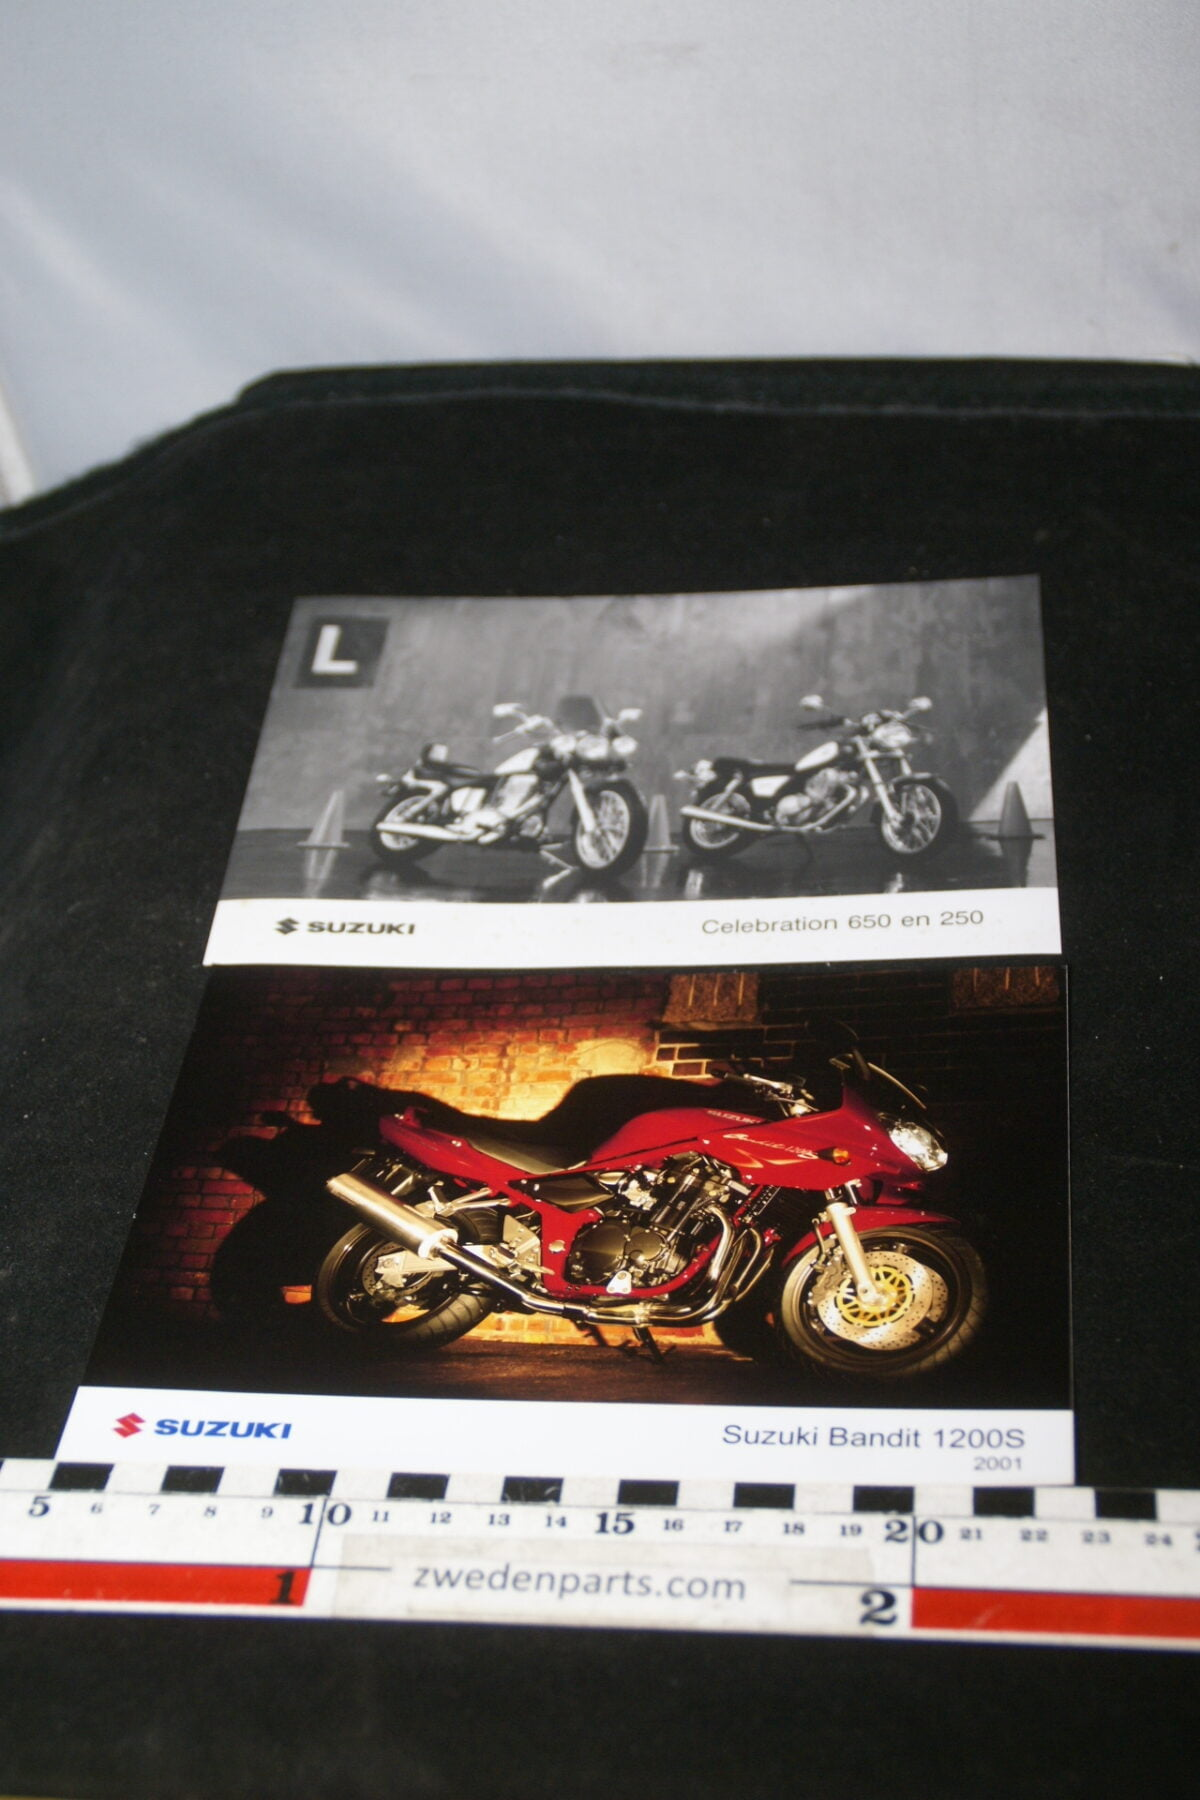 DSC02185 2001 originele persfoto's Suzuki motorfietsen-6120b5d2